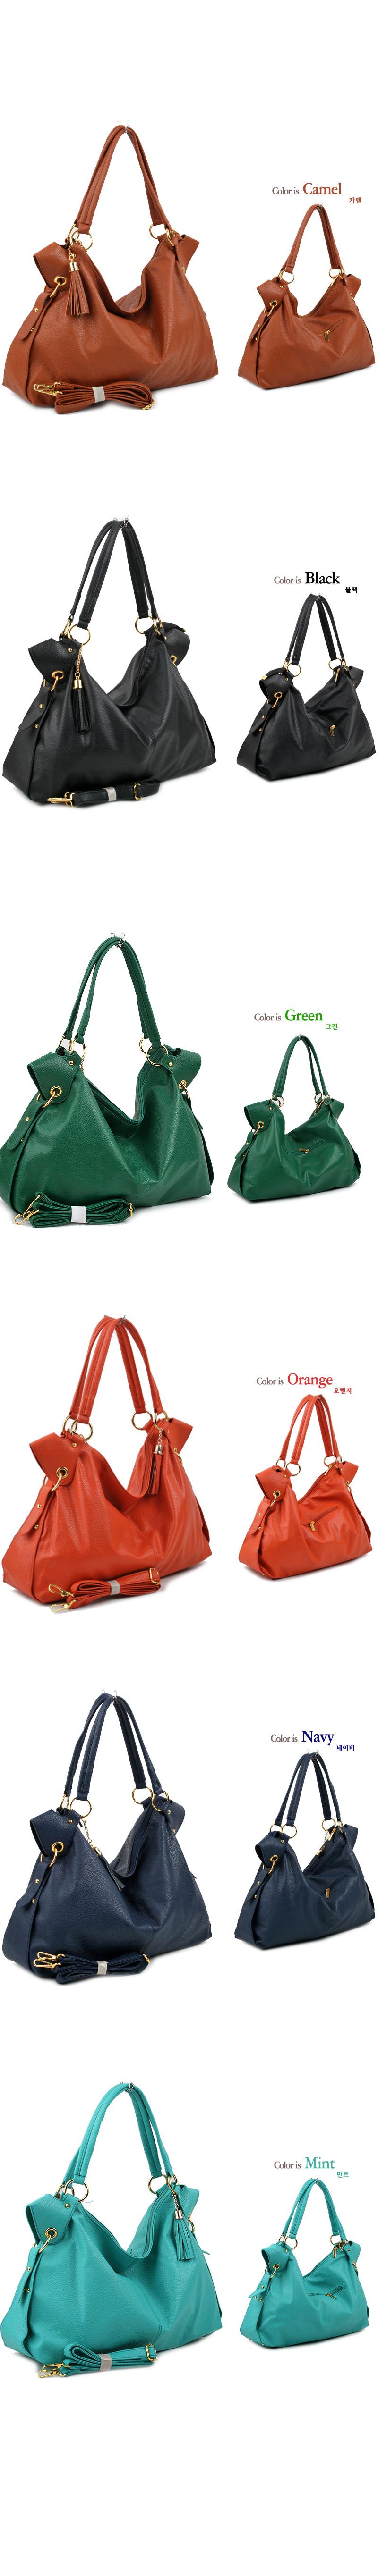 Shoulder&tote bag no. G18177view-1